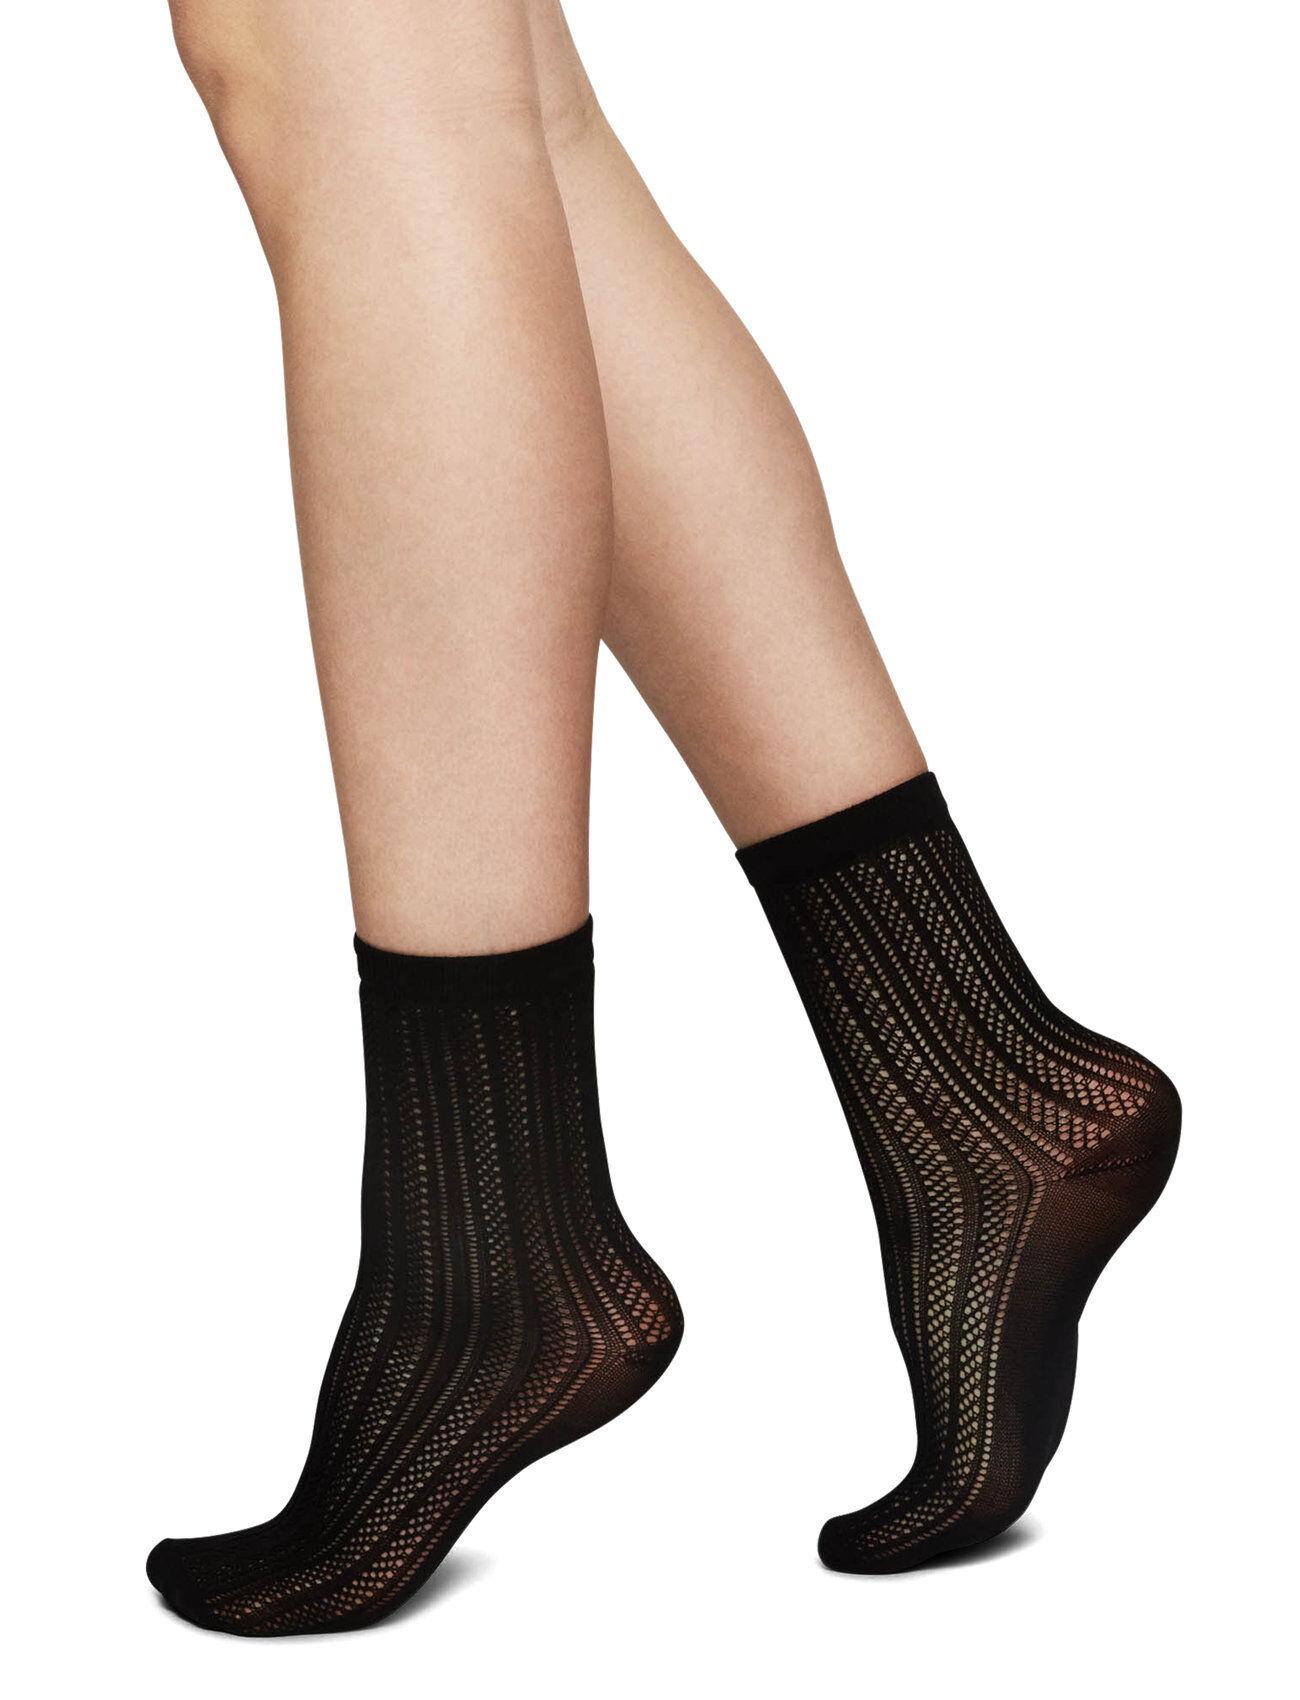 Swedish Stockings Klara Knit Sock Lingerie Hosiery Socks Musta Swedish Stockings